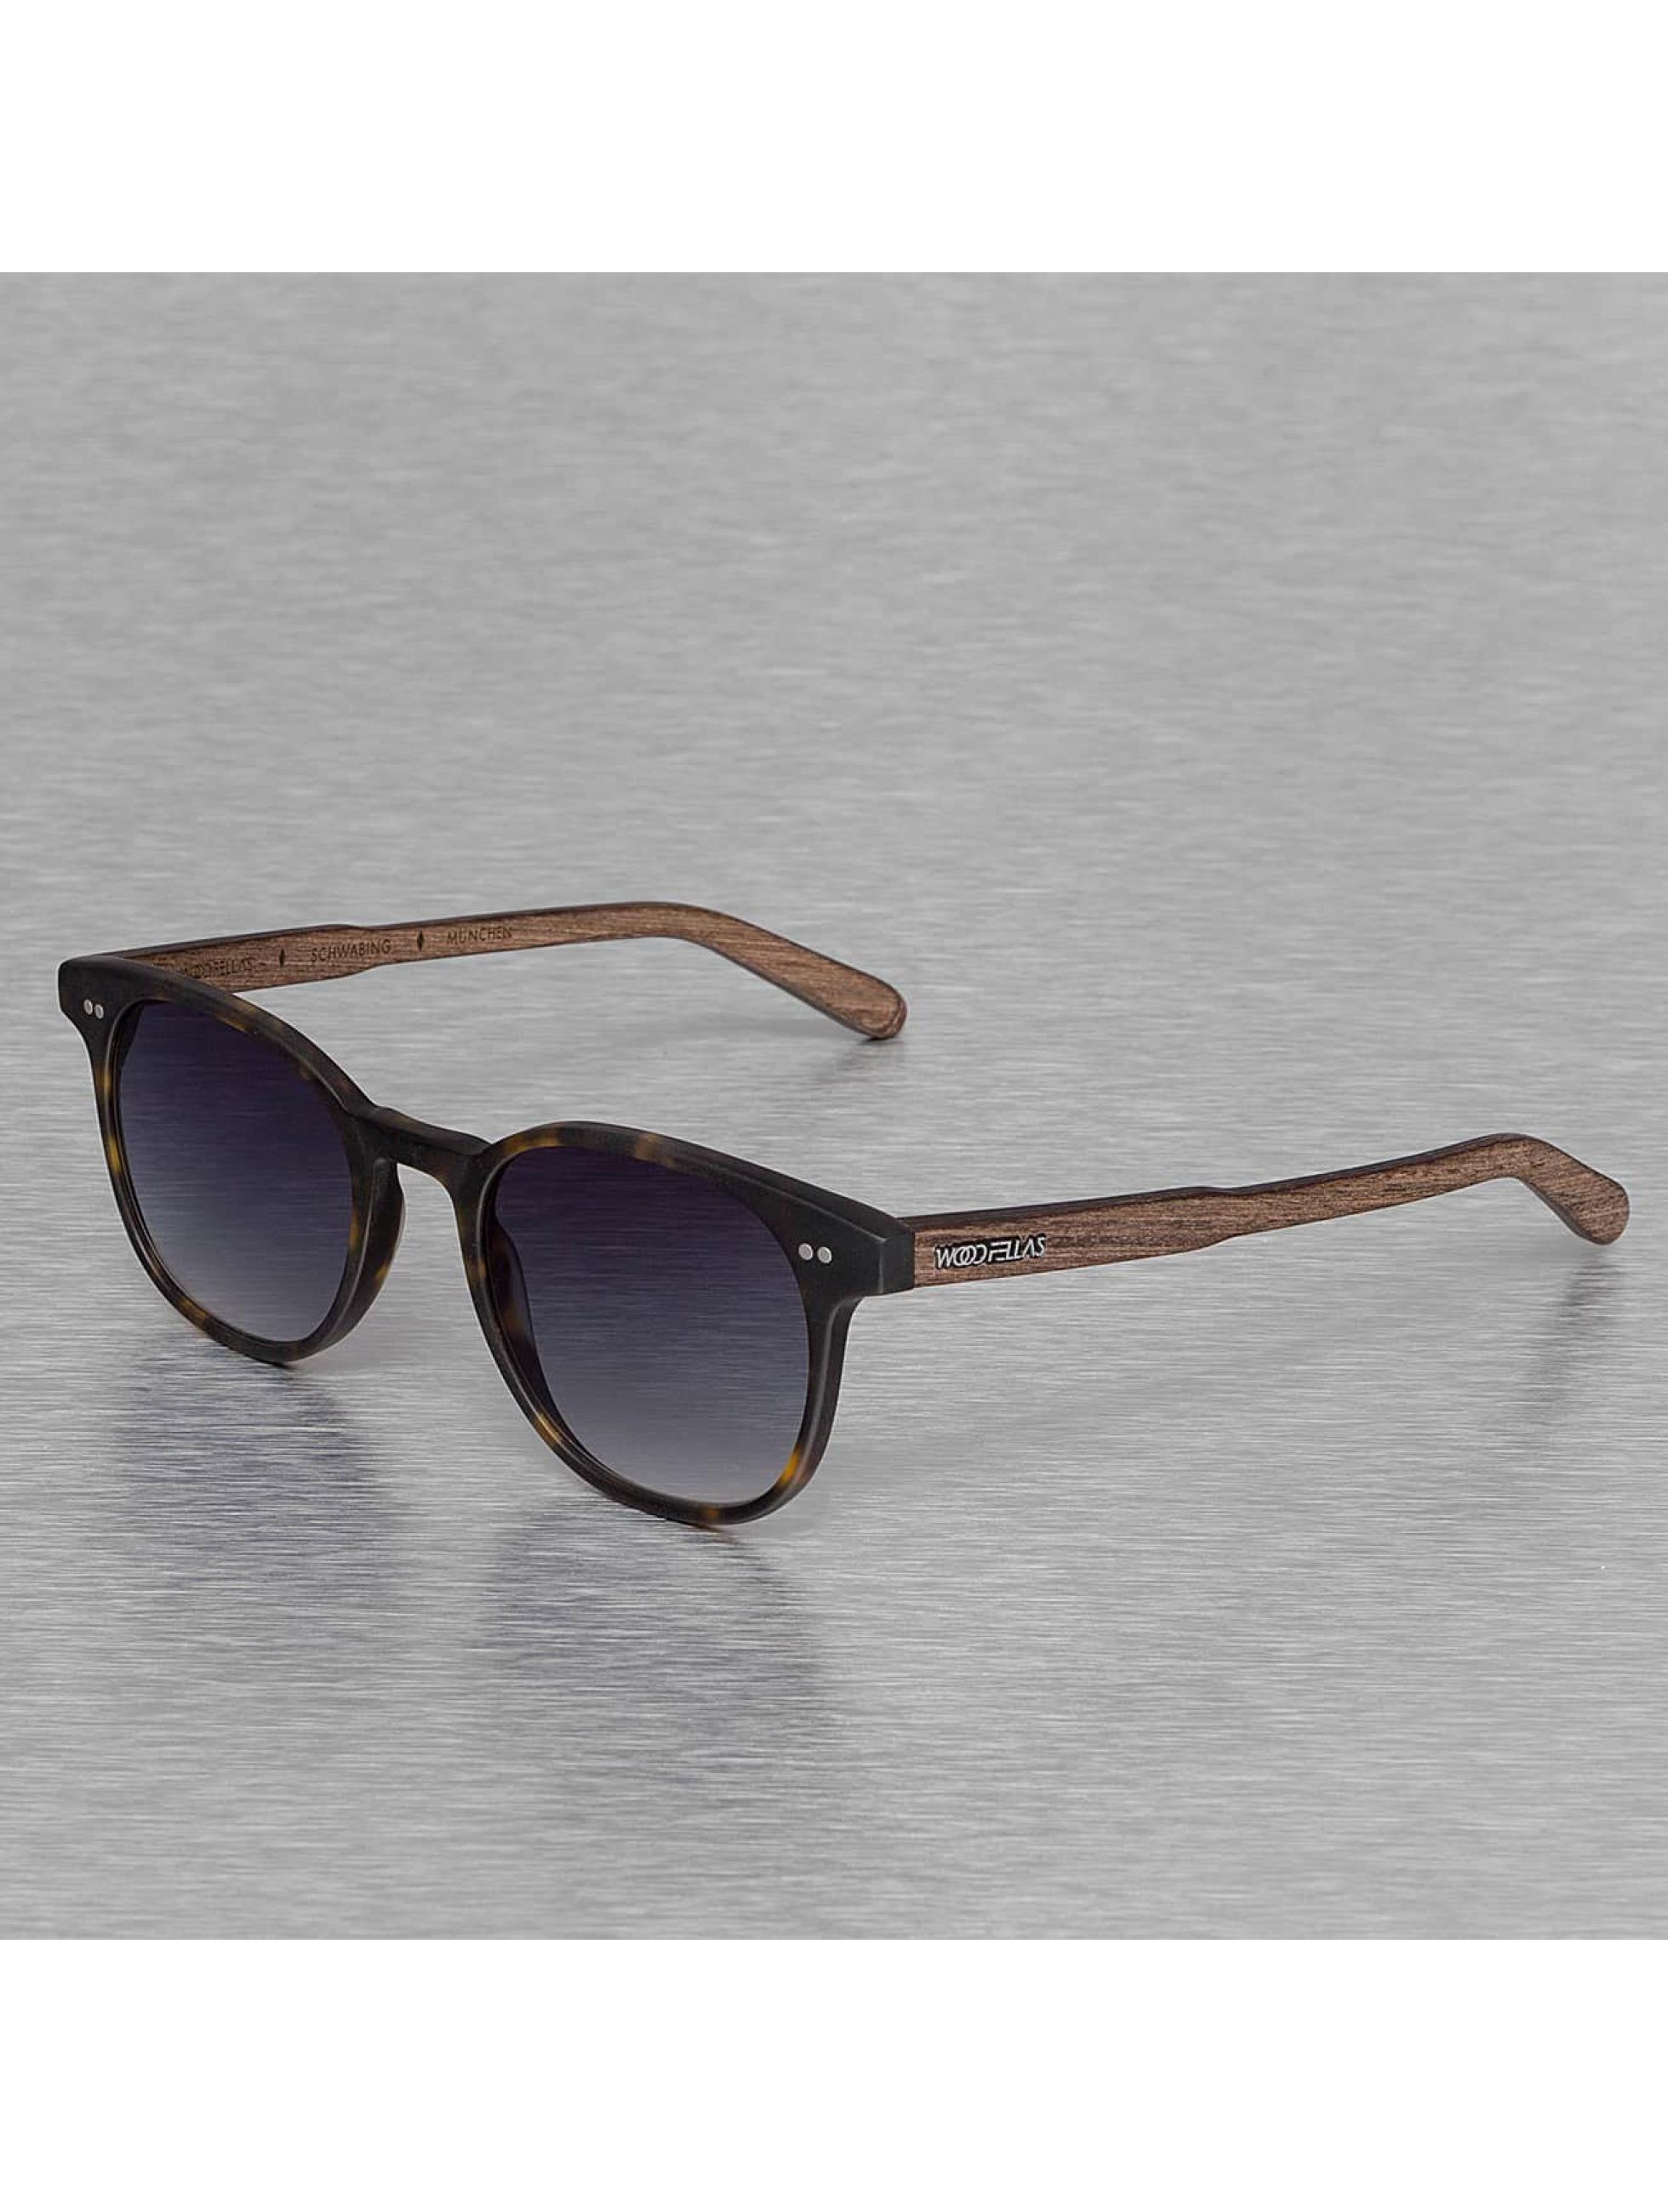 Wood Fellas Eyewear Männer,Frauen Sonnenbrille Eyewear Schwabing Polarized Mirror in braun